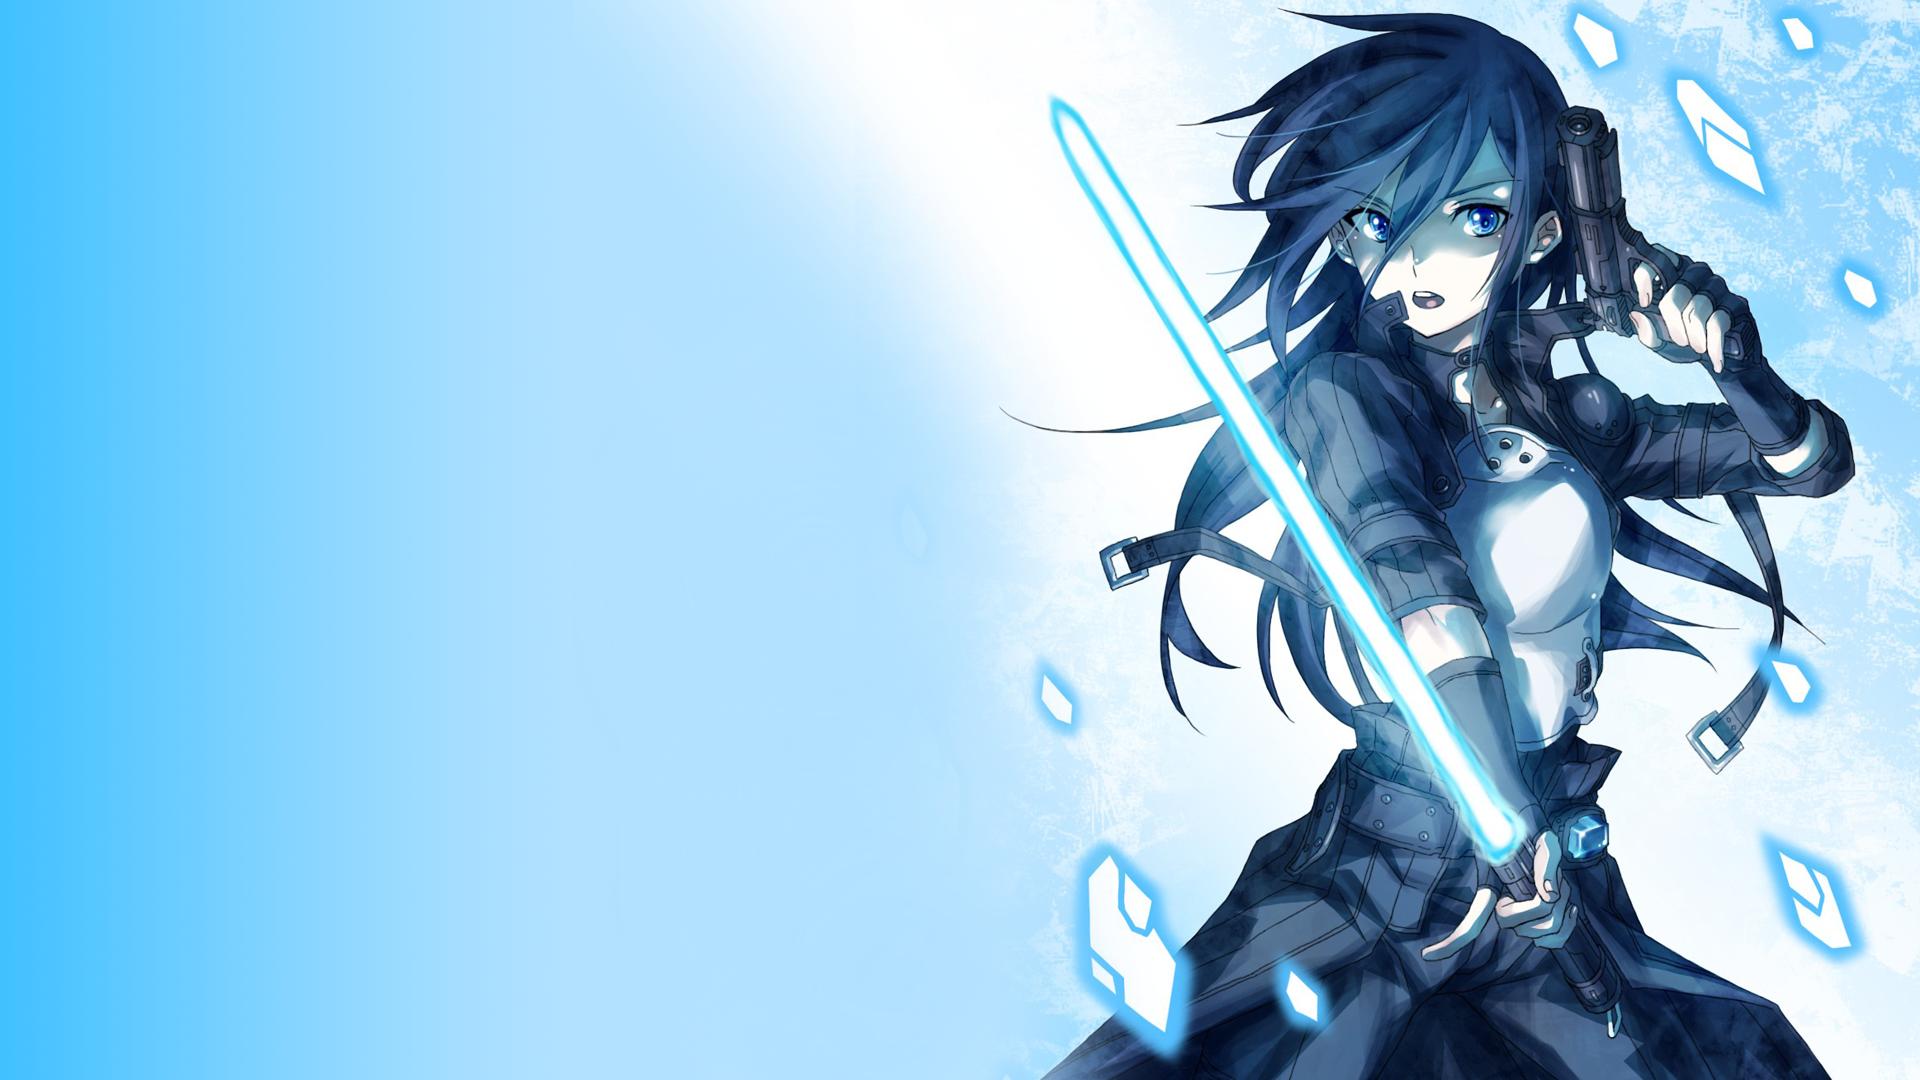 ~Wallpaper Anime~ Gun%2520Gale%2520Online%2520%255BSword%2520Art%2520Online%255D